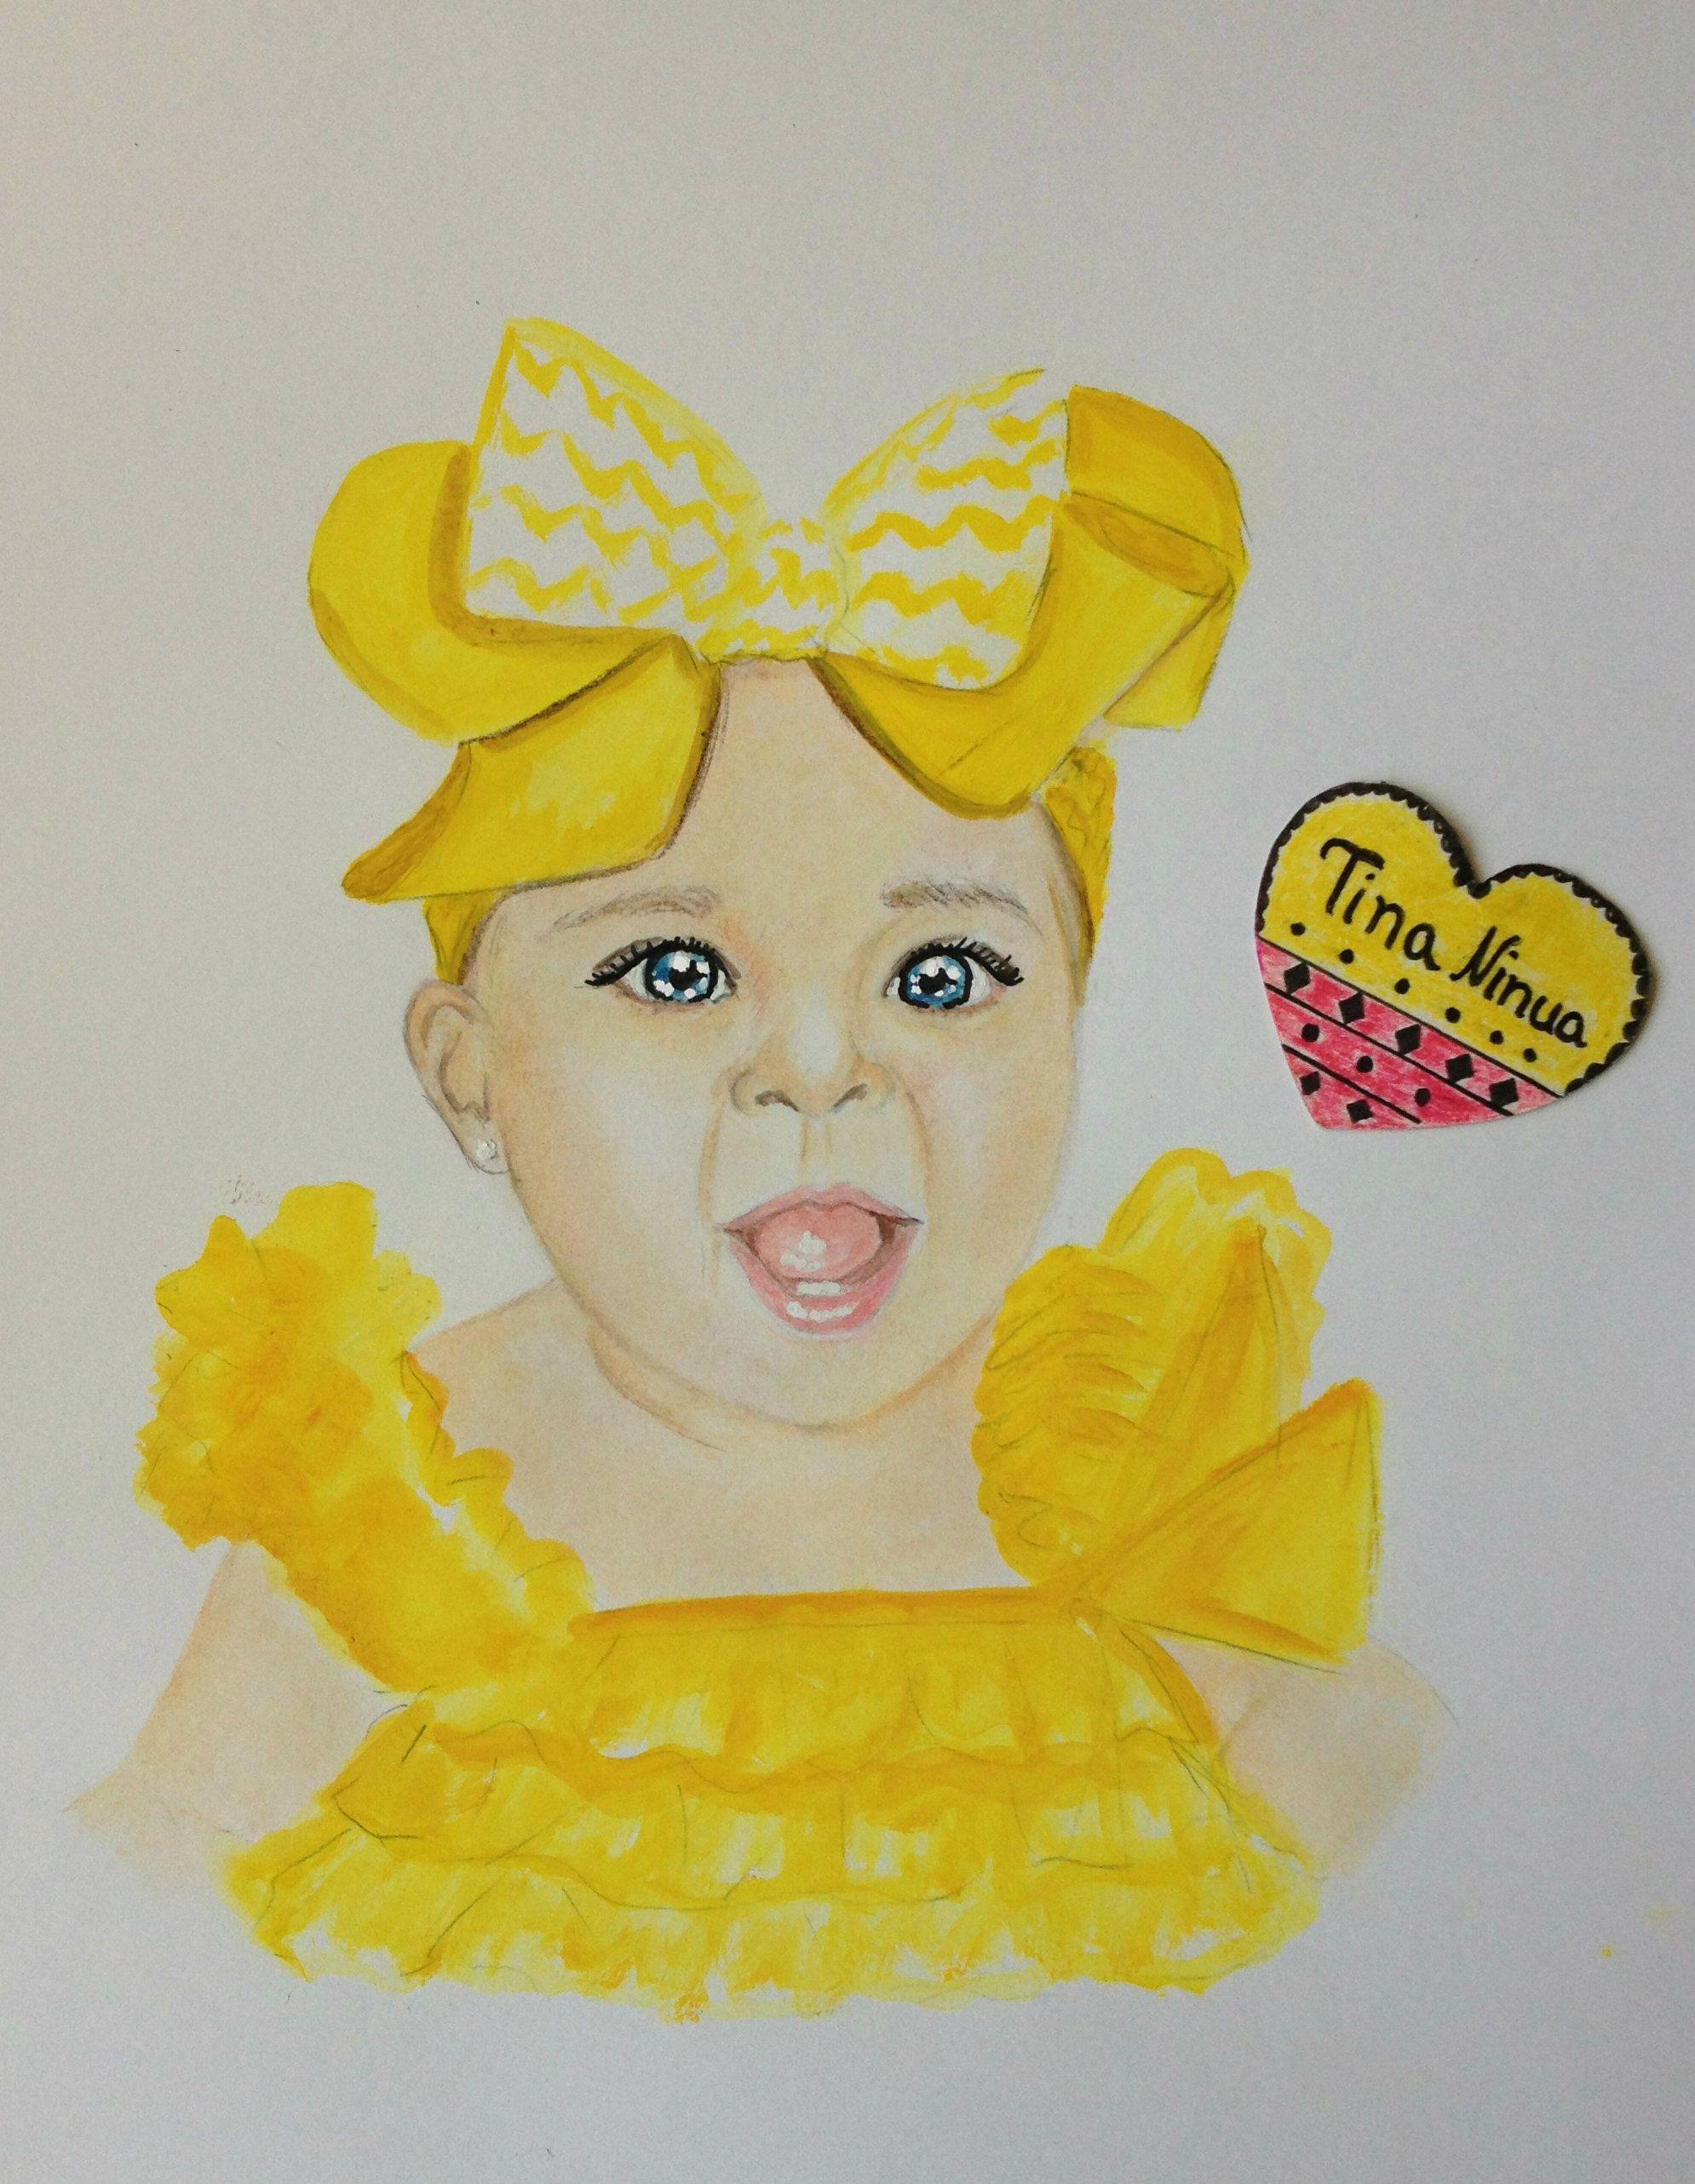 #baby #art #drawing #illustration #colorpencil #watercolor #artist #fashionillustration #yellow #beautifulfaces #worldchildren